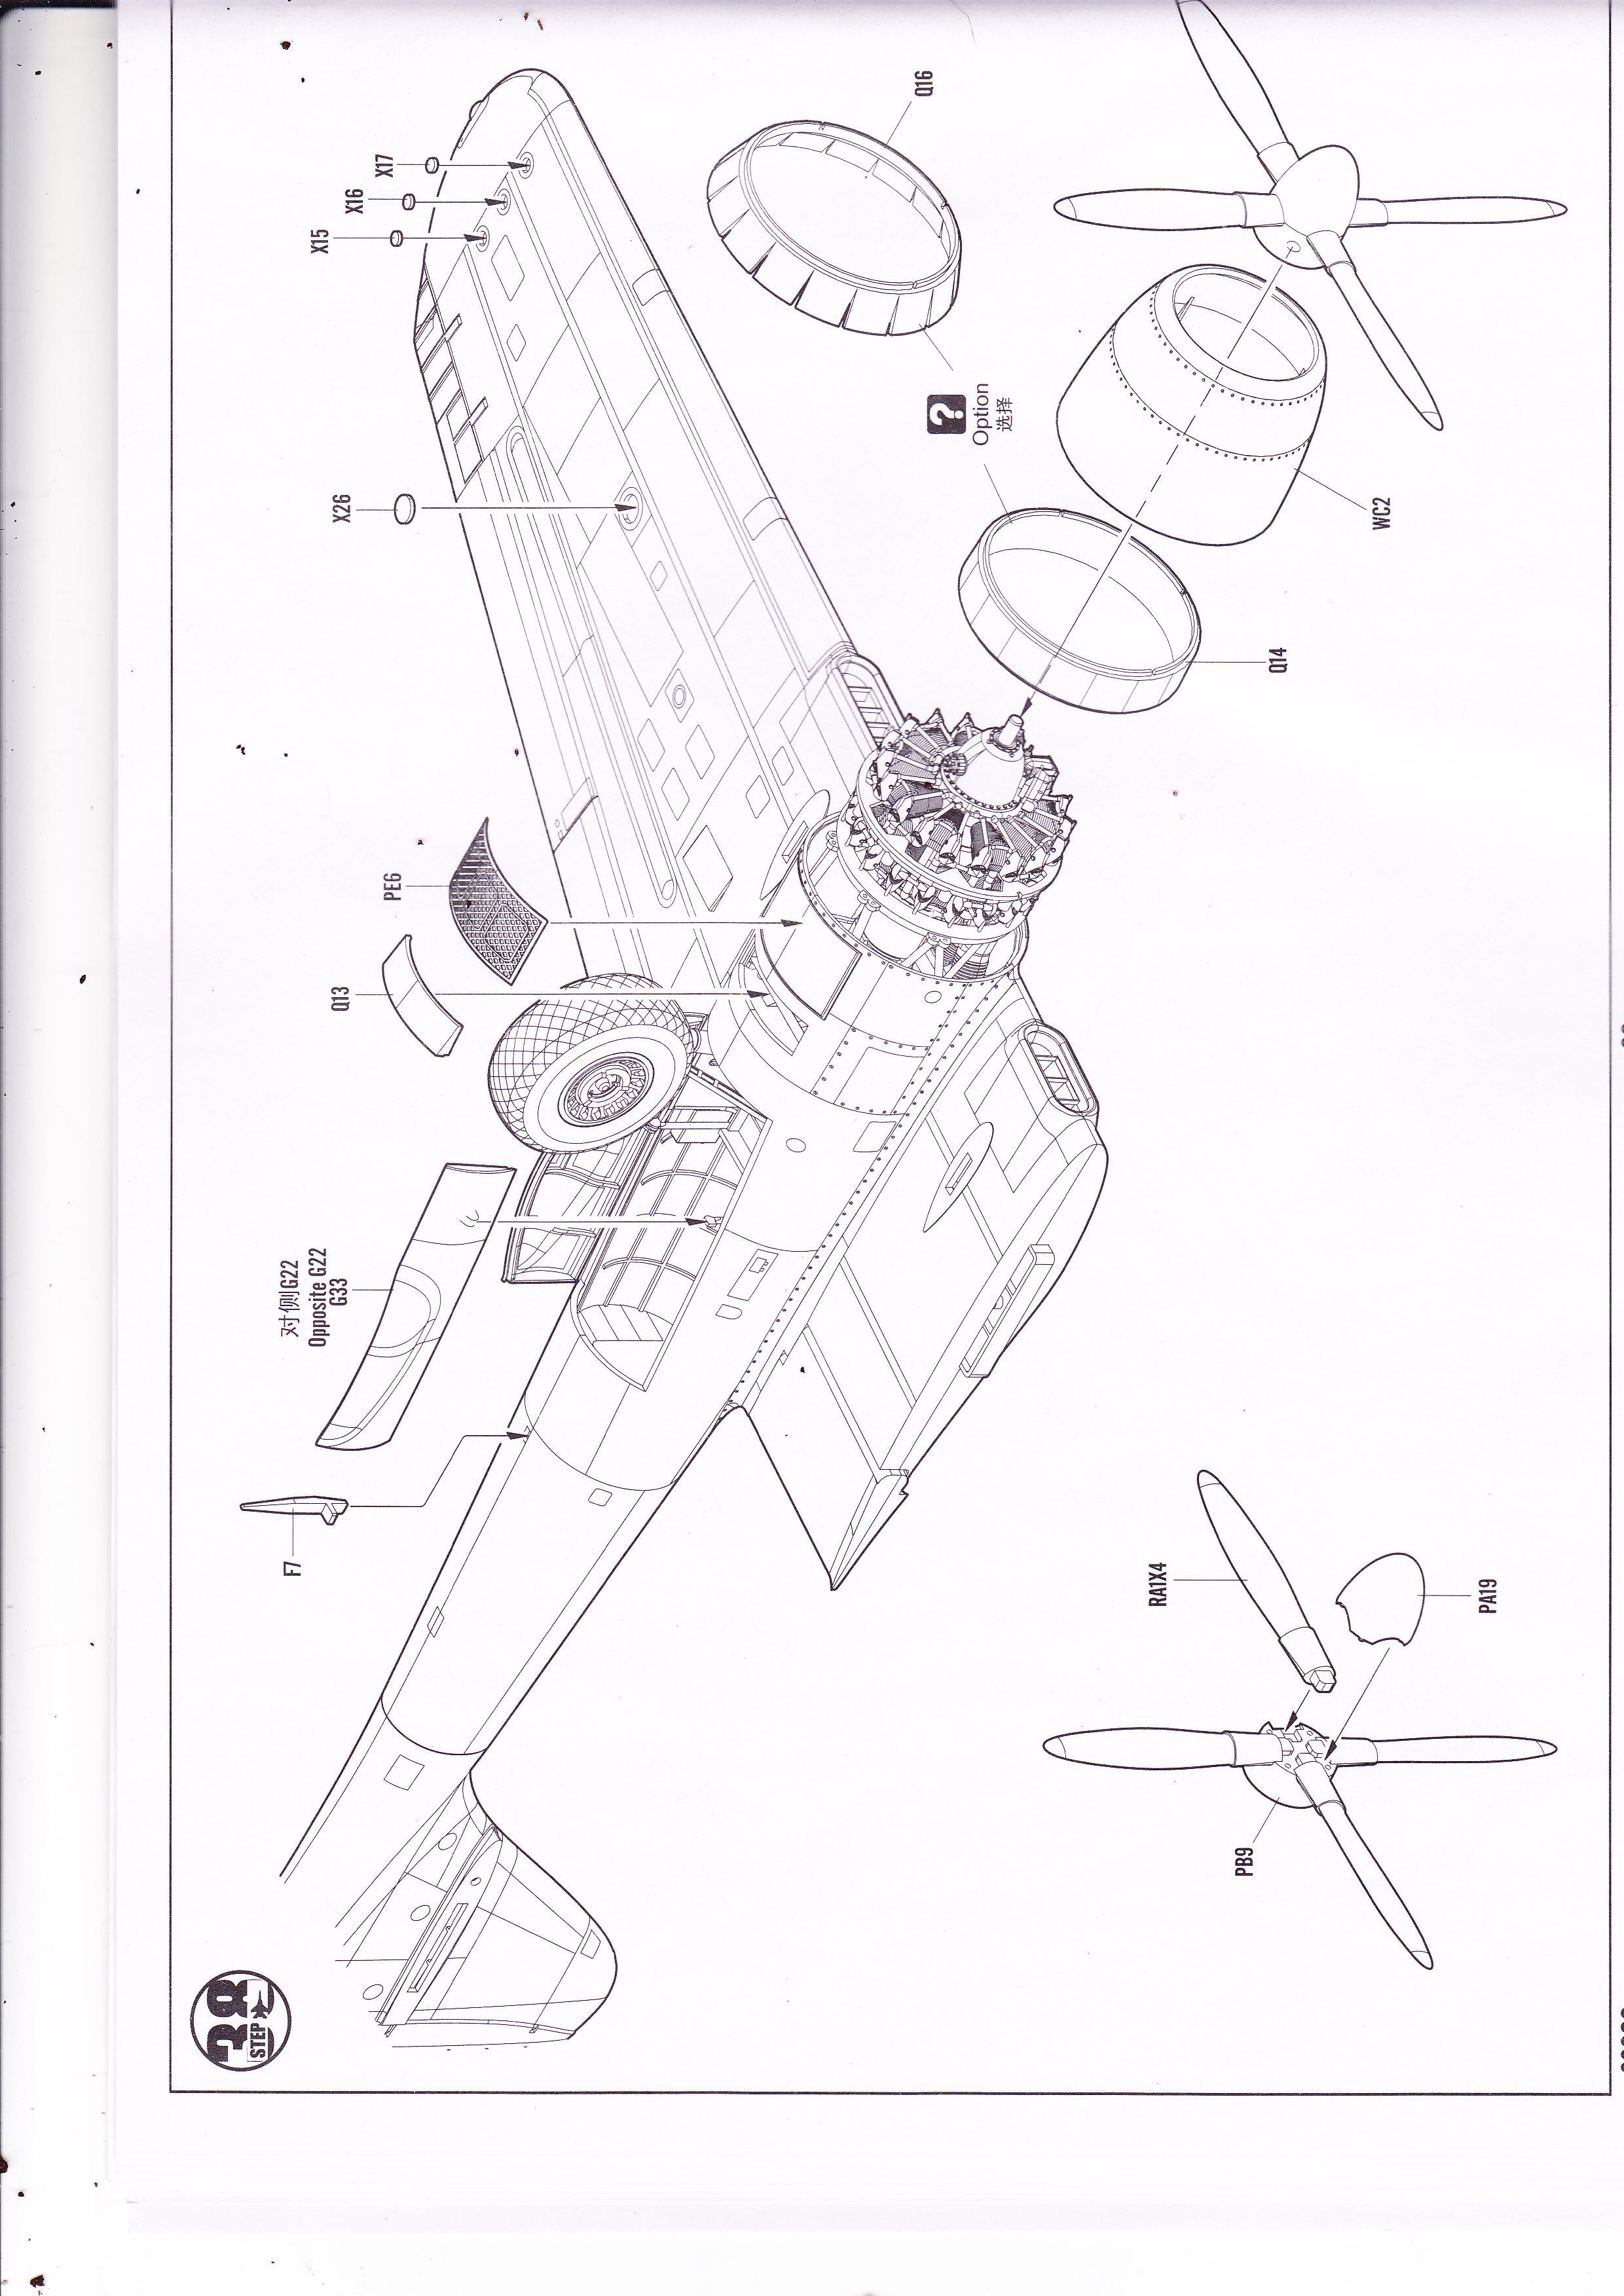 P-61 B Black Widow Hobby Boss Img0025hj